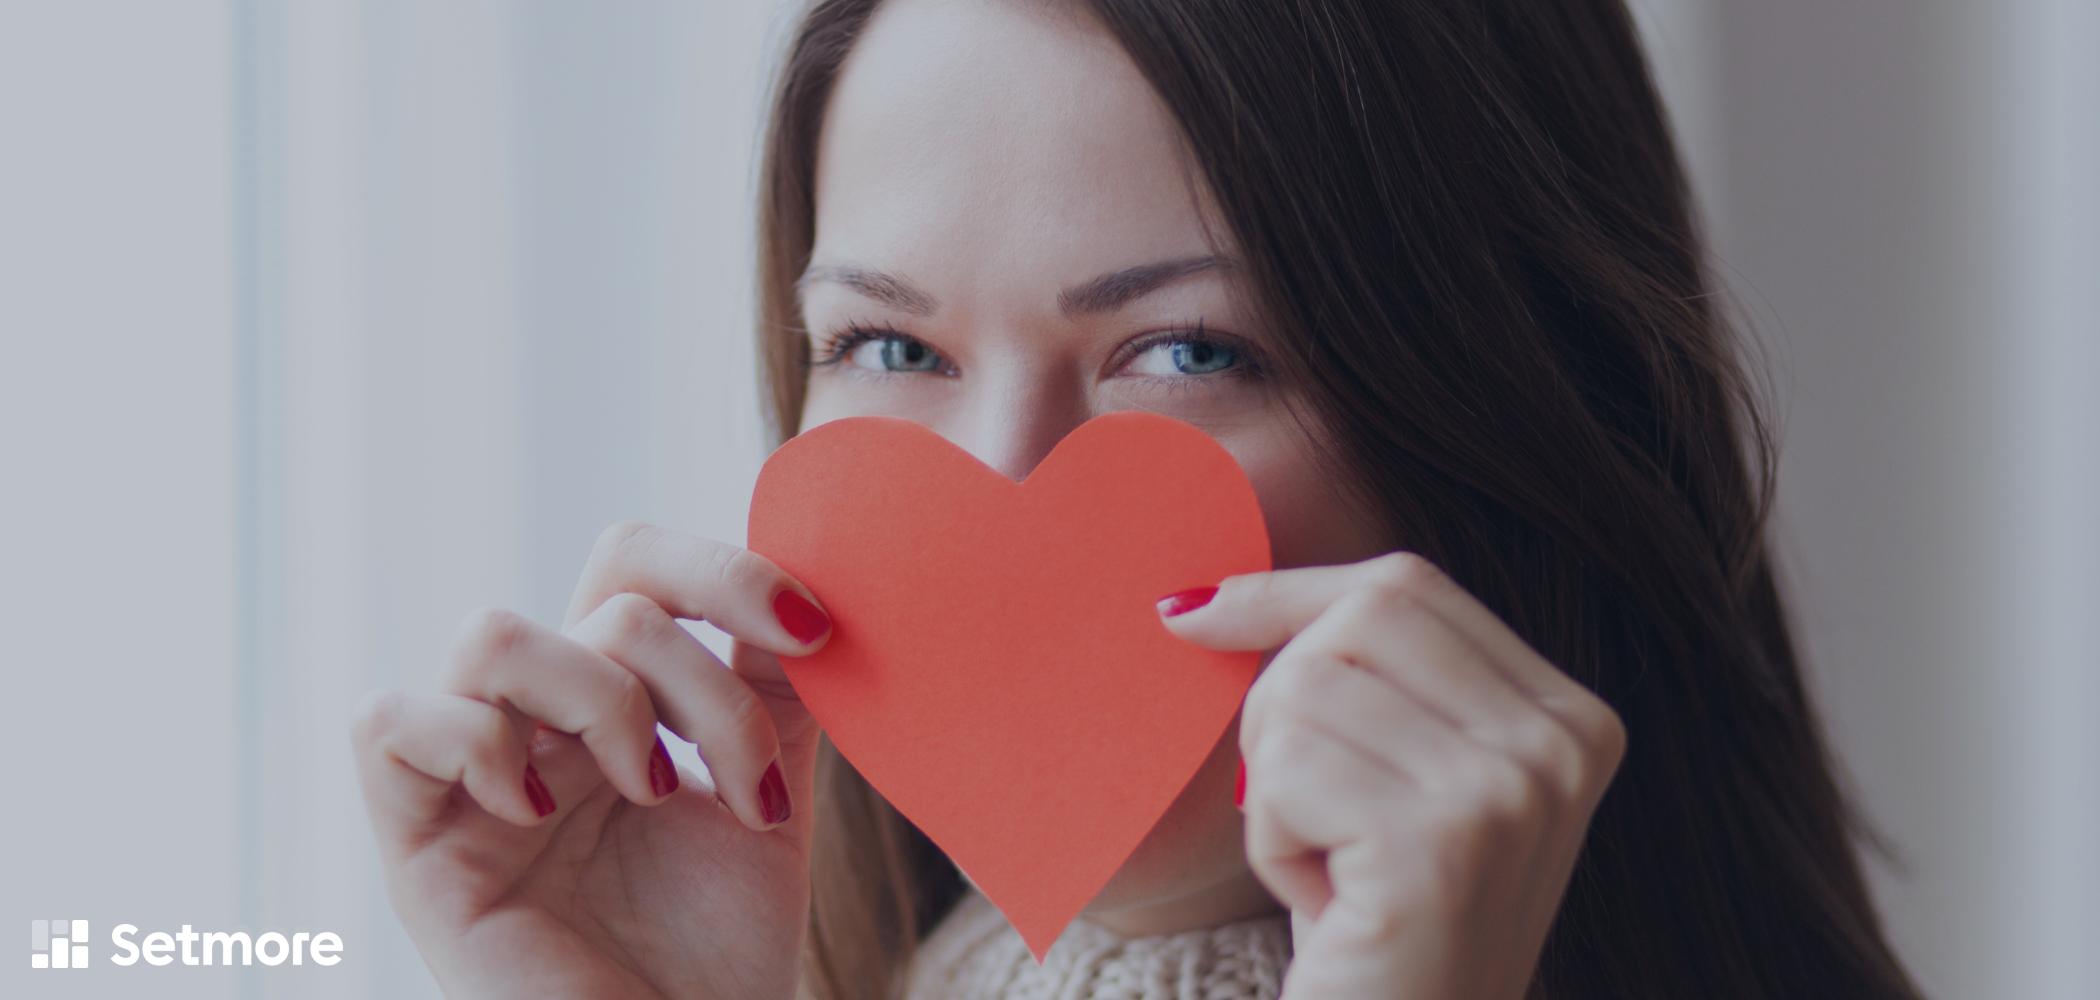 blog creatives women with a heart